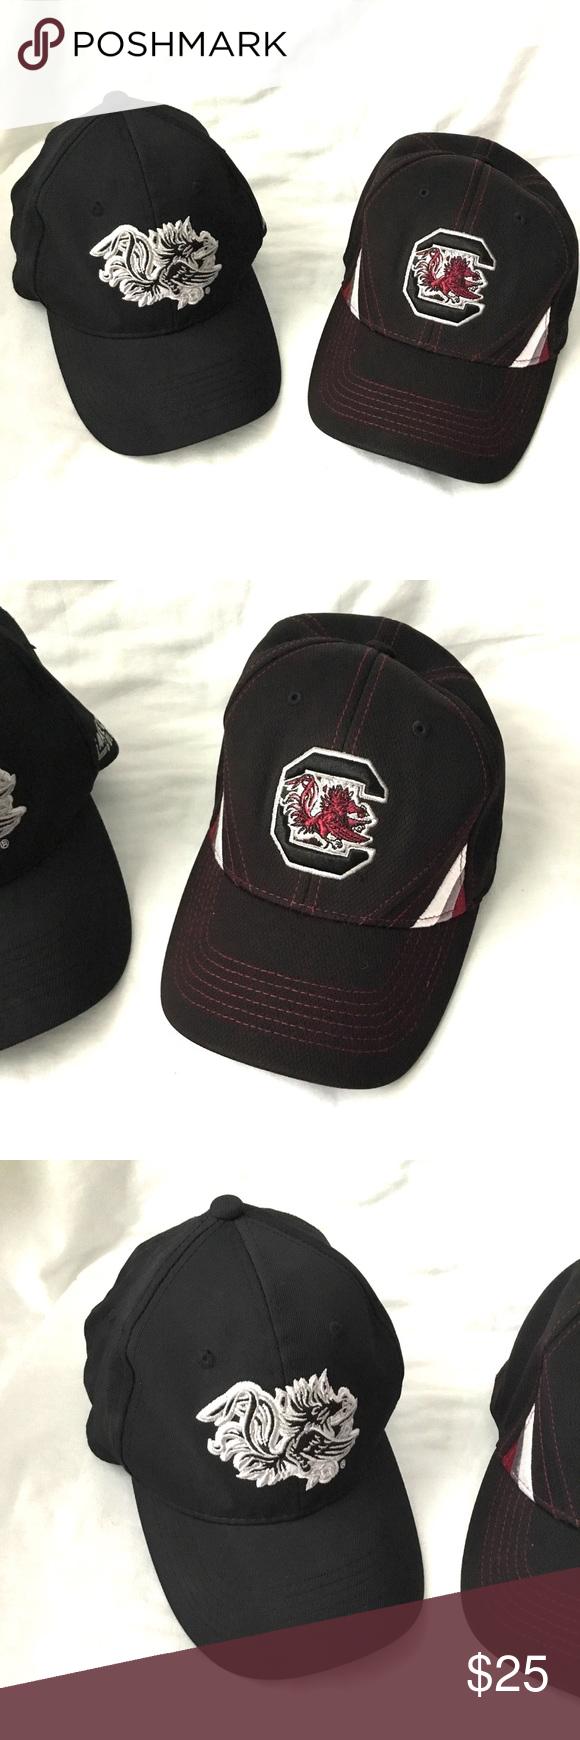 497c5eabb04a NCAA South Carolina Gamecock Hat Lot Of 2 in 2018